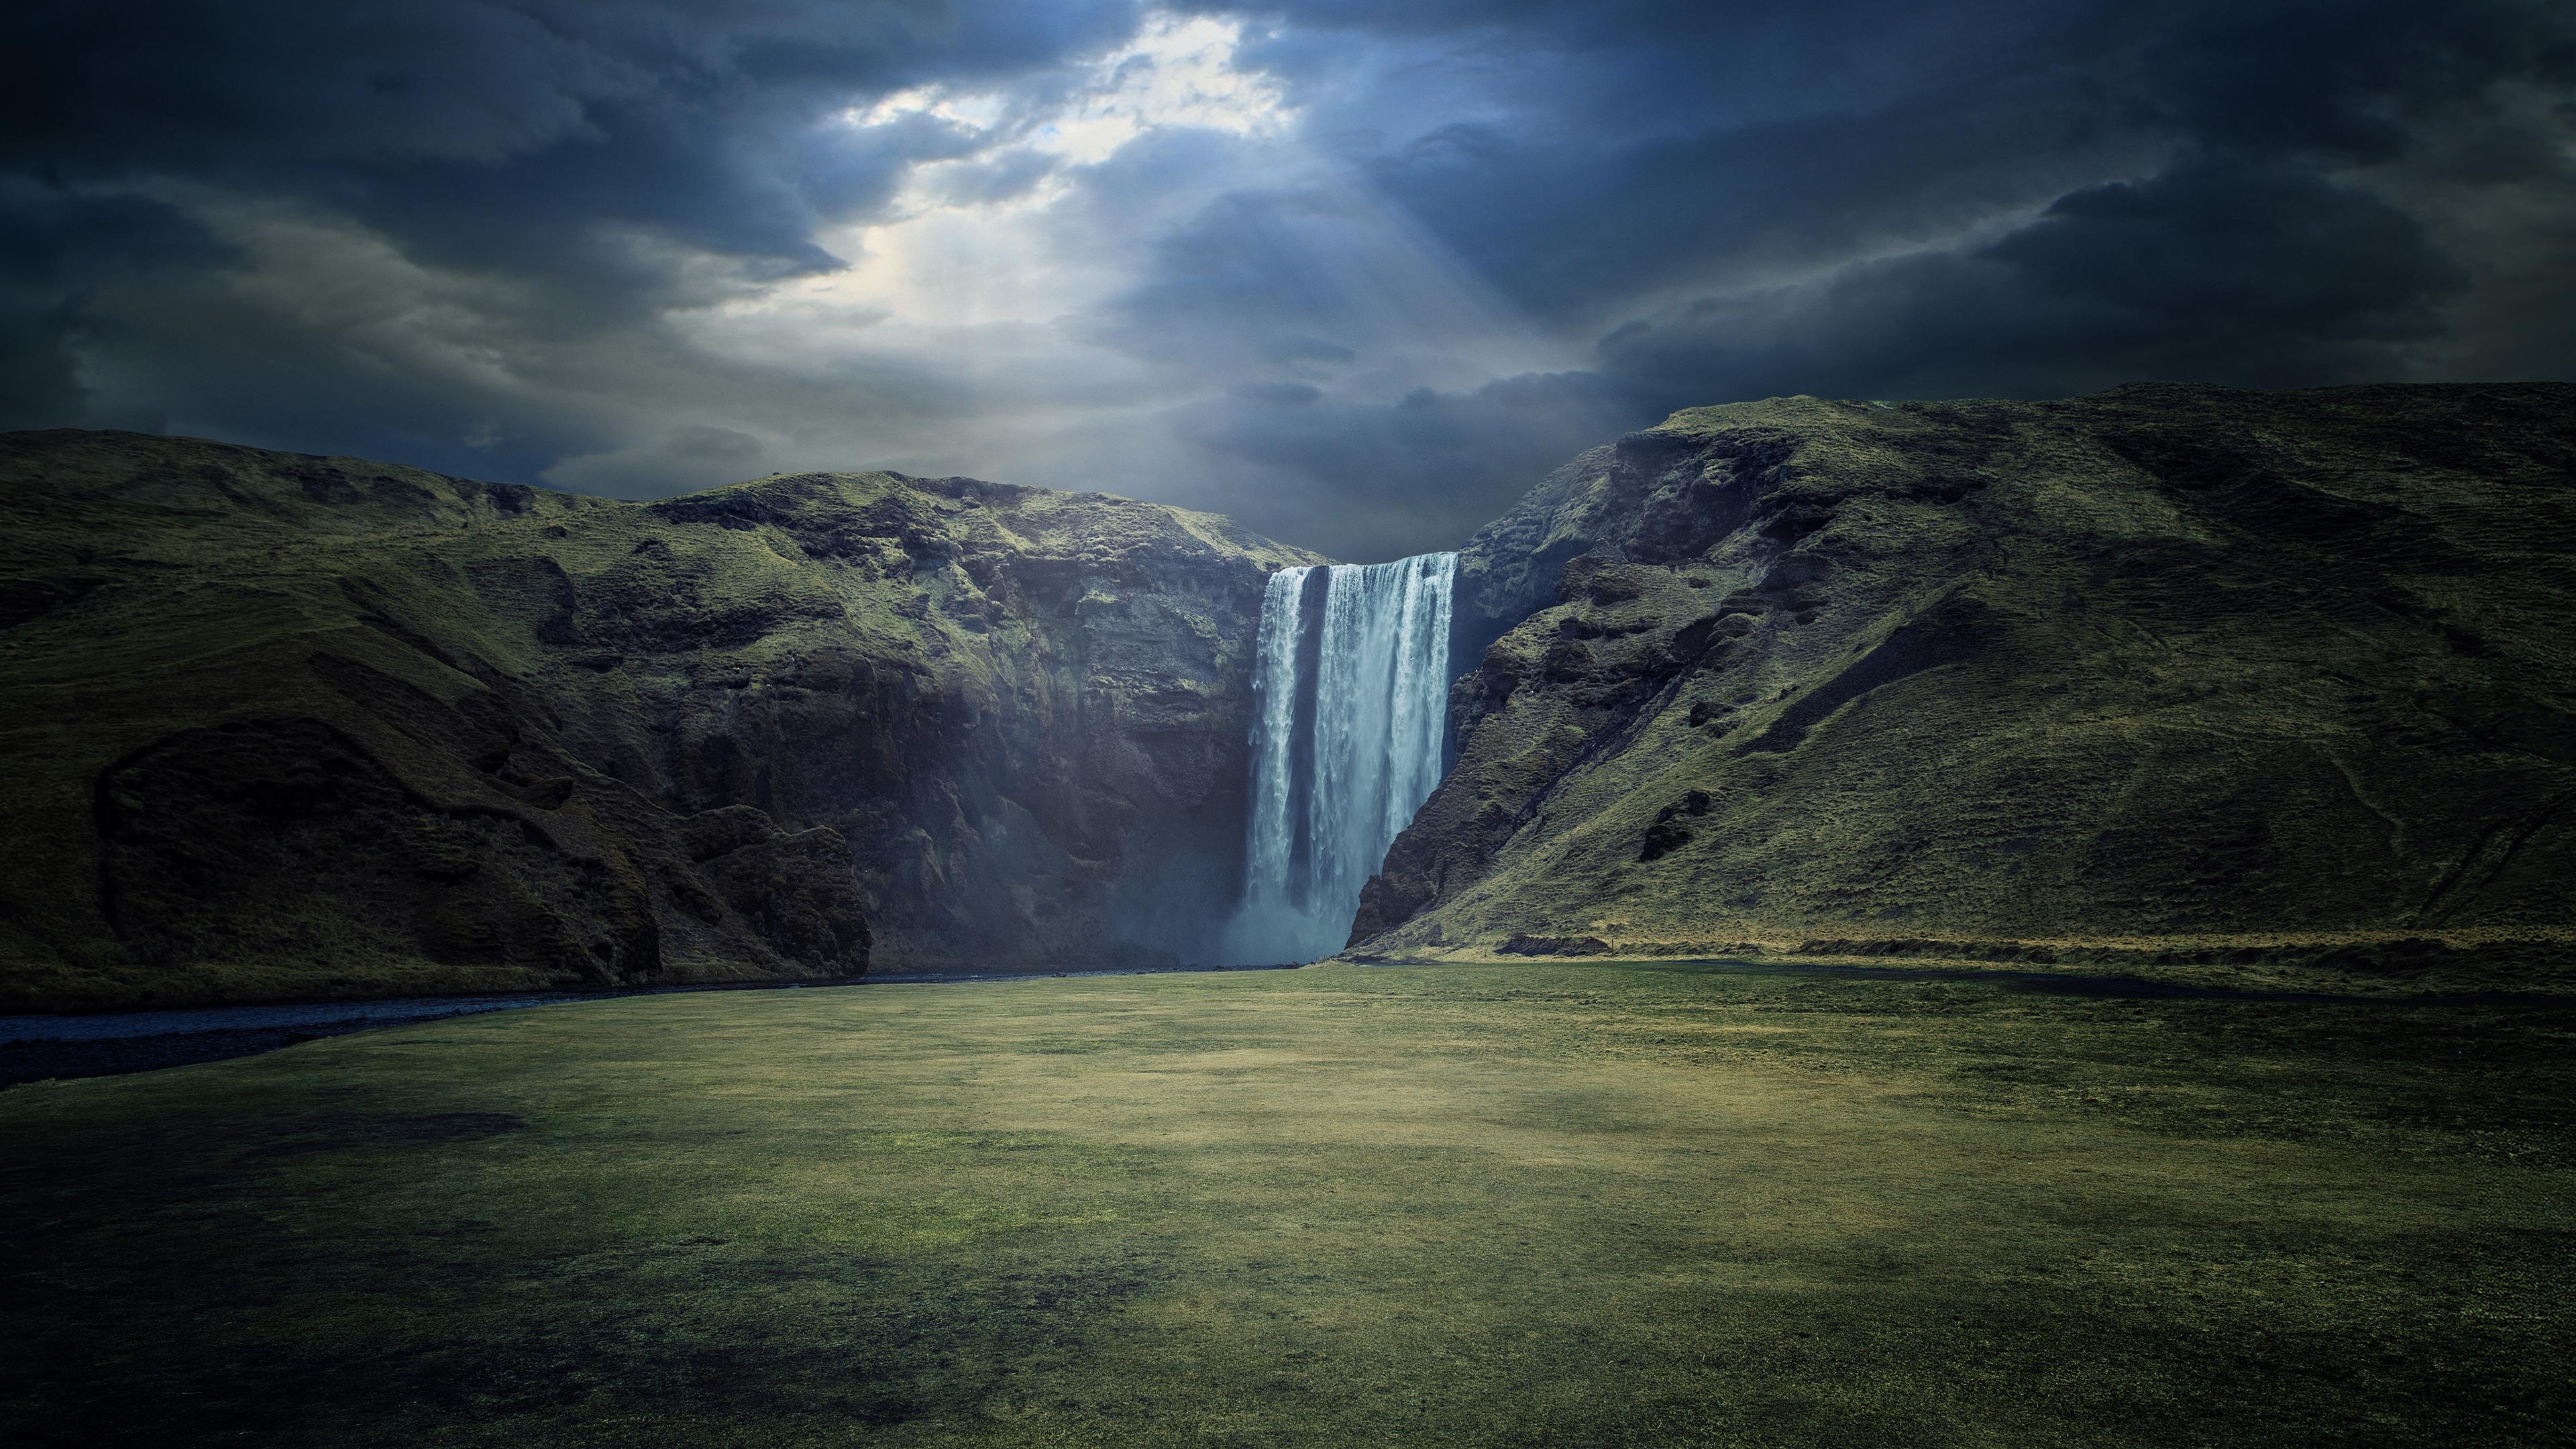 Travel Background Hd Wallpapers Free Niagra Falls Waterfall Wallpaper High Quality Pixelstalk Net